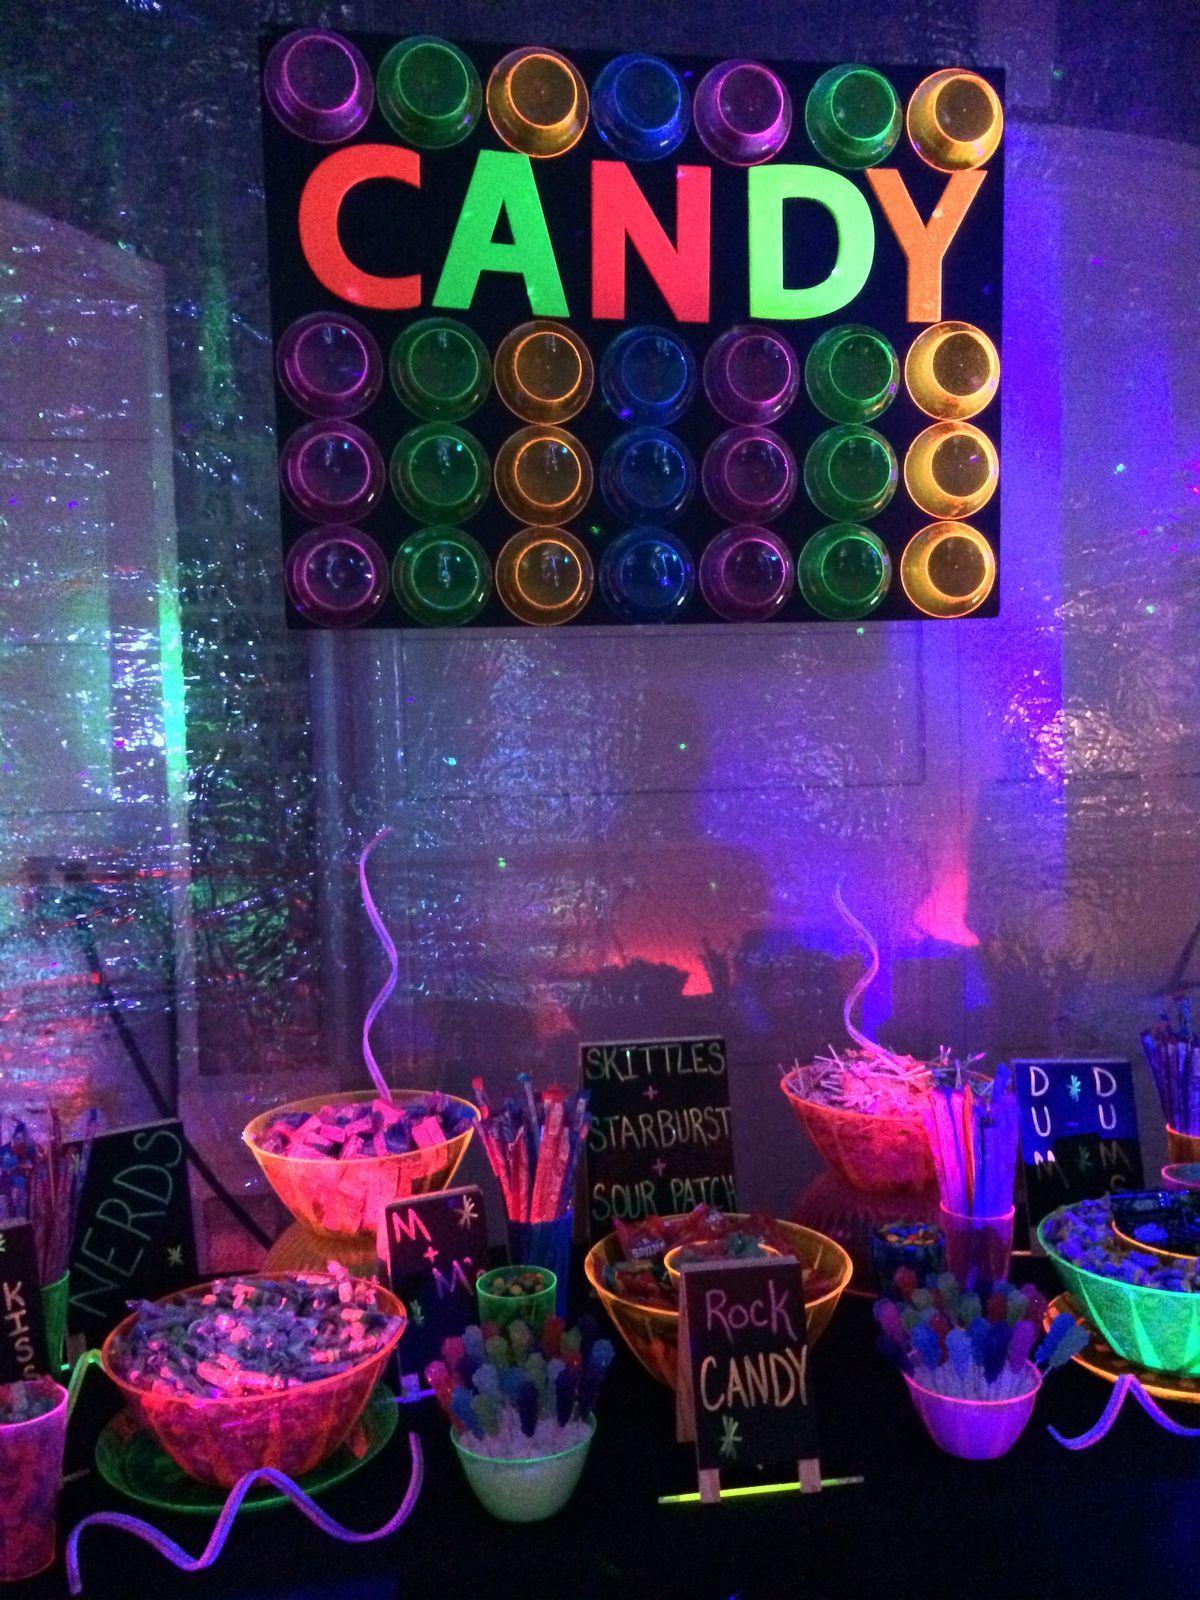 Candy buffet ideas for sweet sixteen - Glow In The Dark Candy Buffet